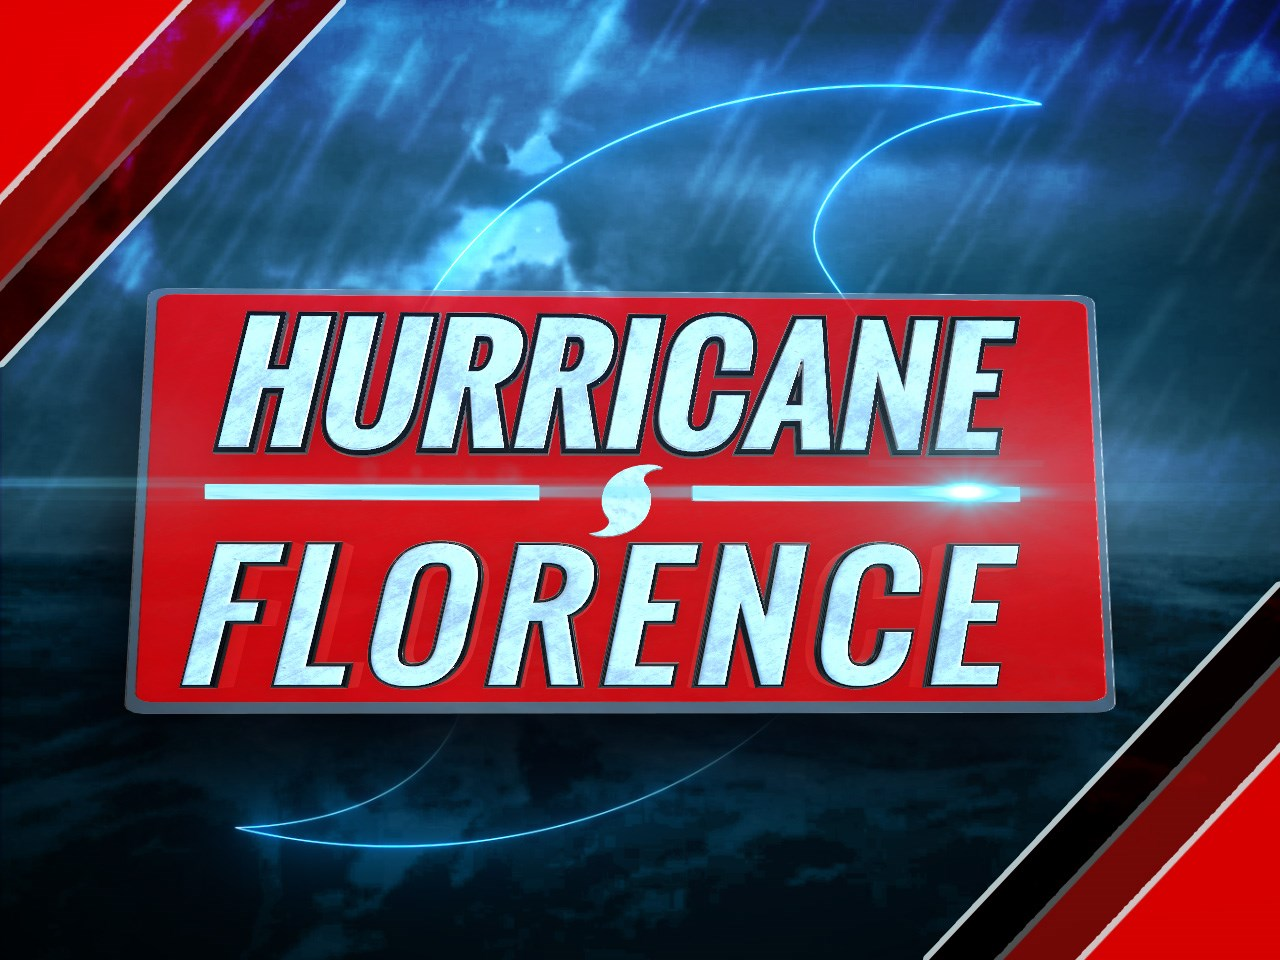 1280x960_hurricaneFlorence_1536606861651.jpg